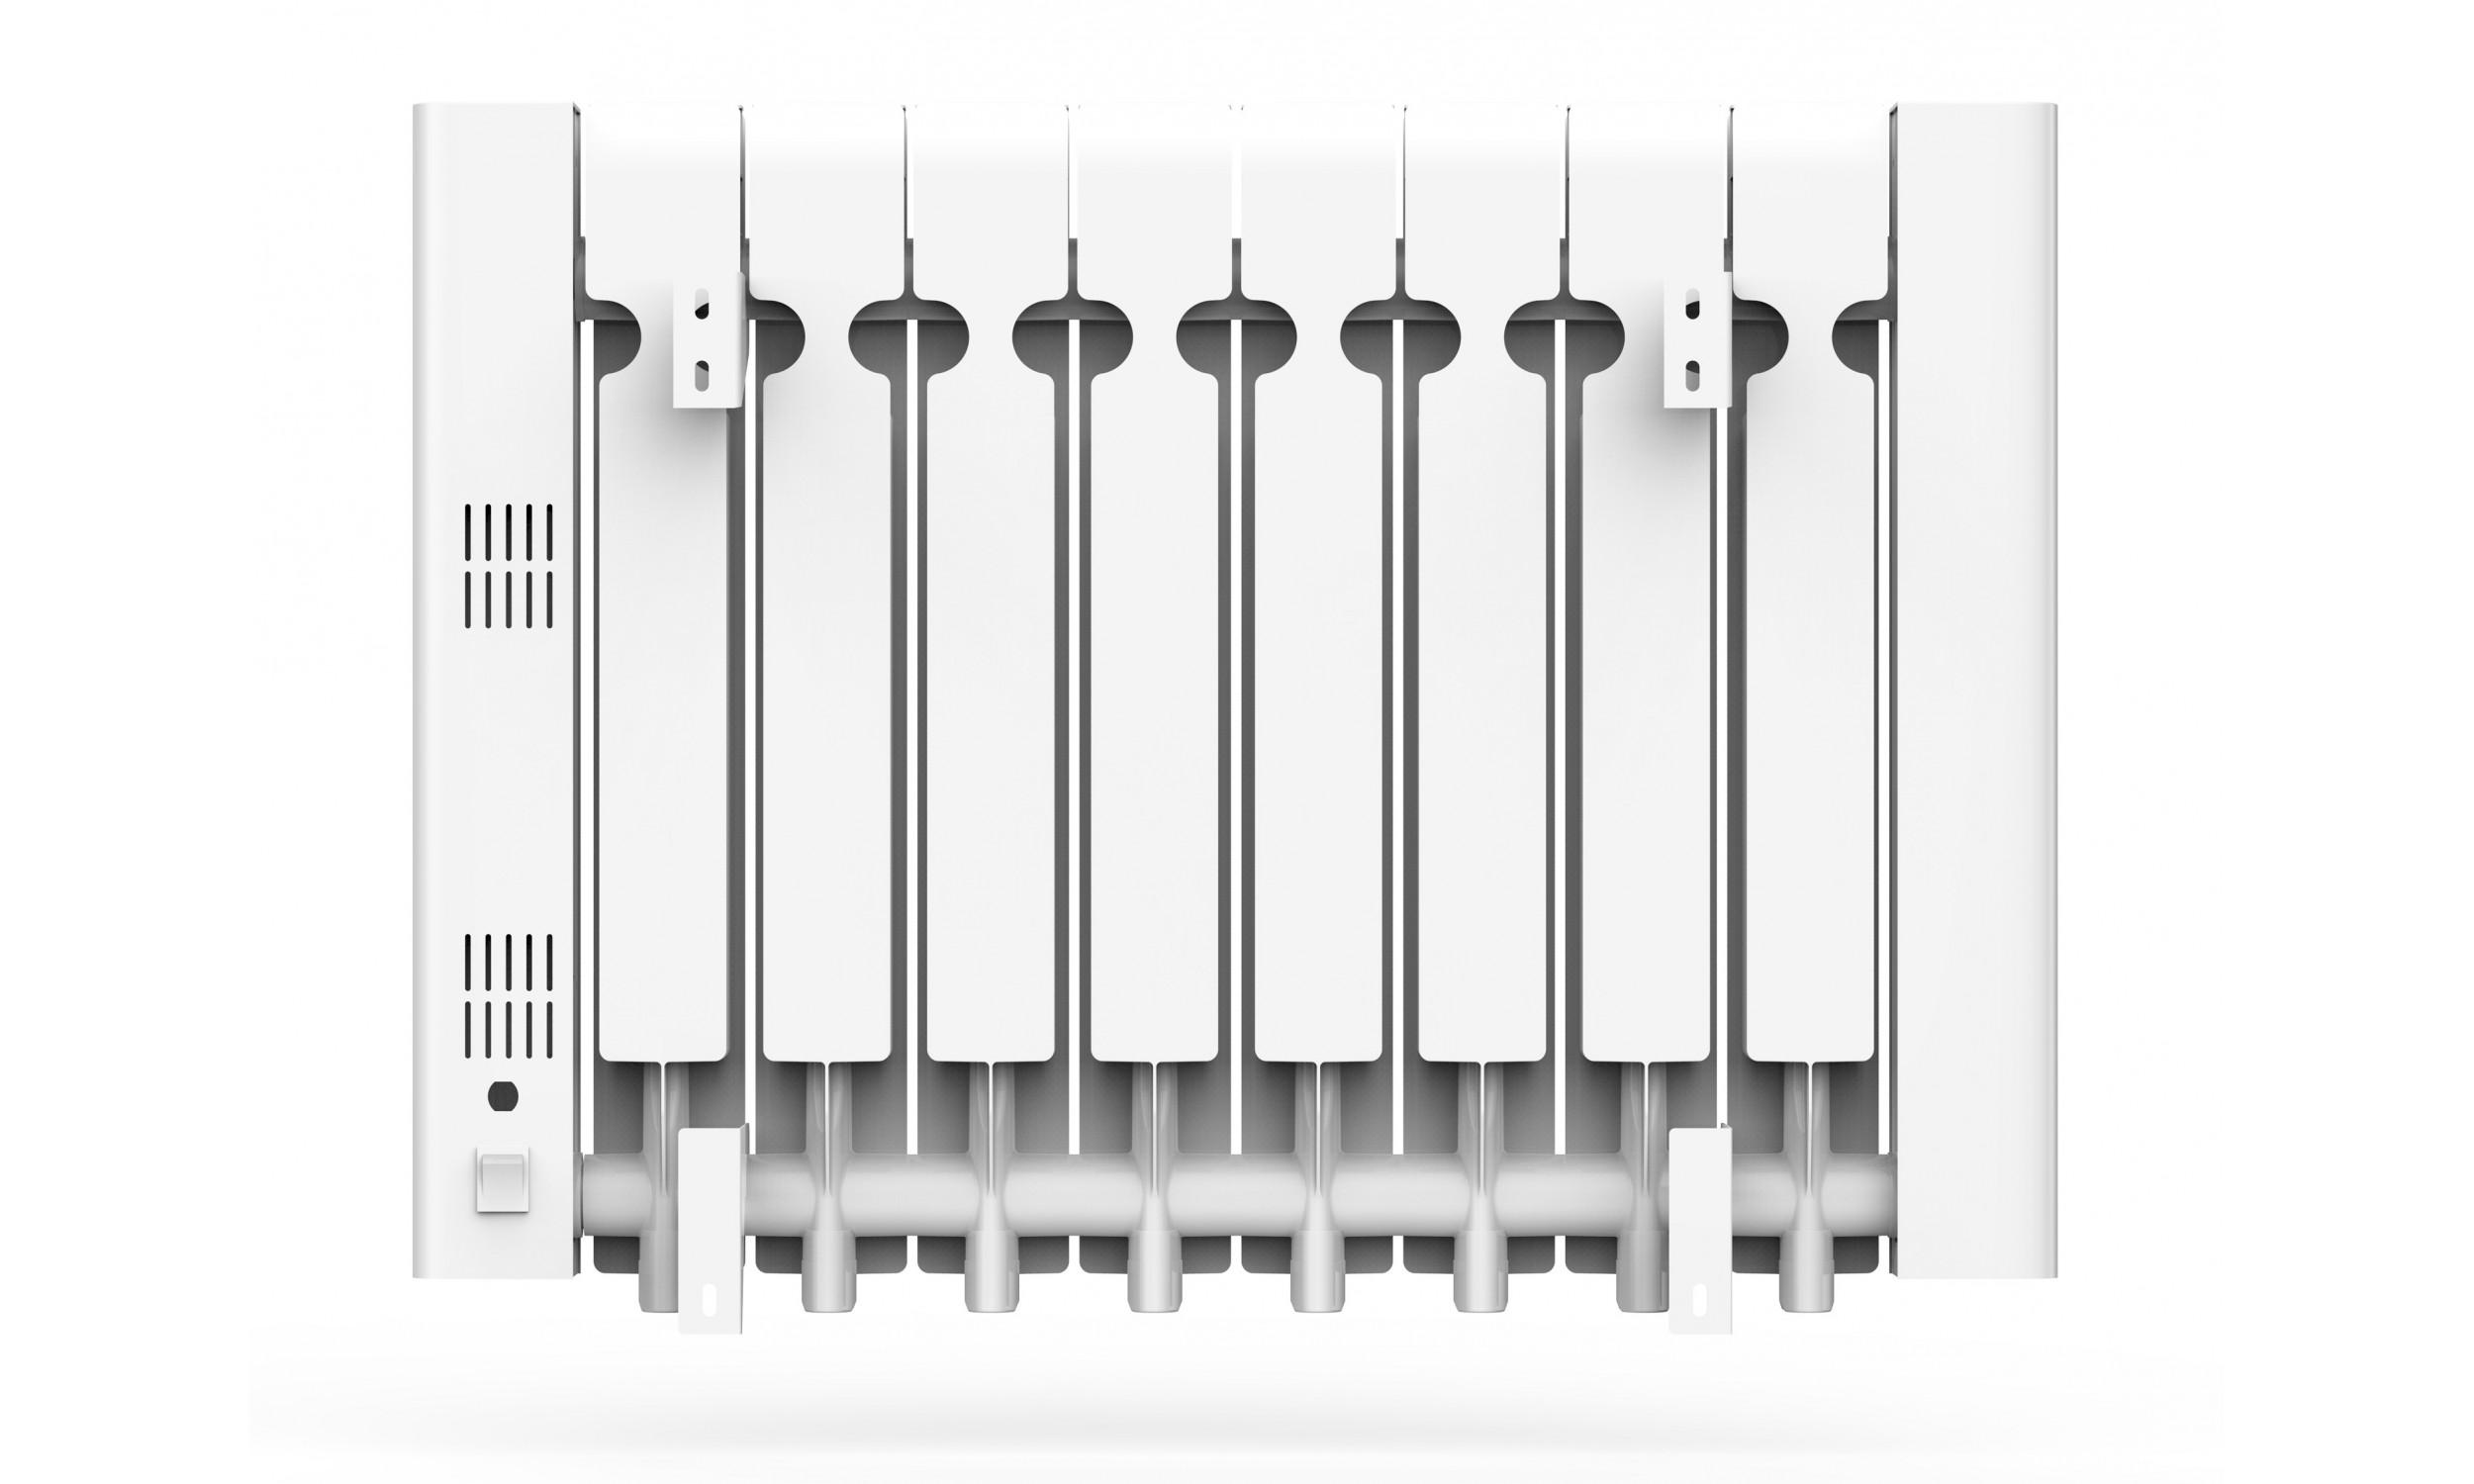 Emisor térmico de inercia digital con fluido interno 1500W con control WIFI